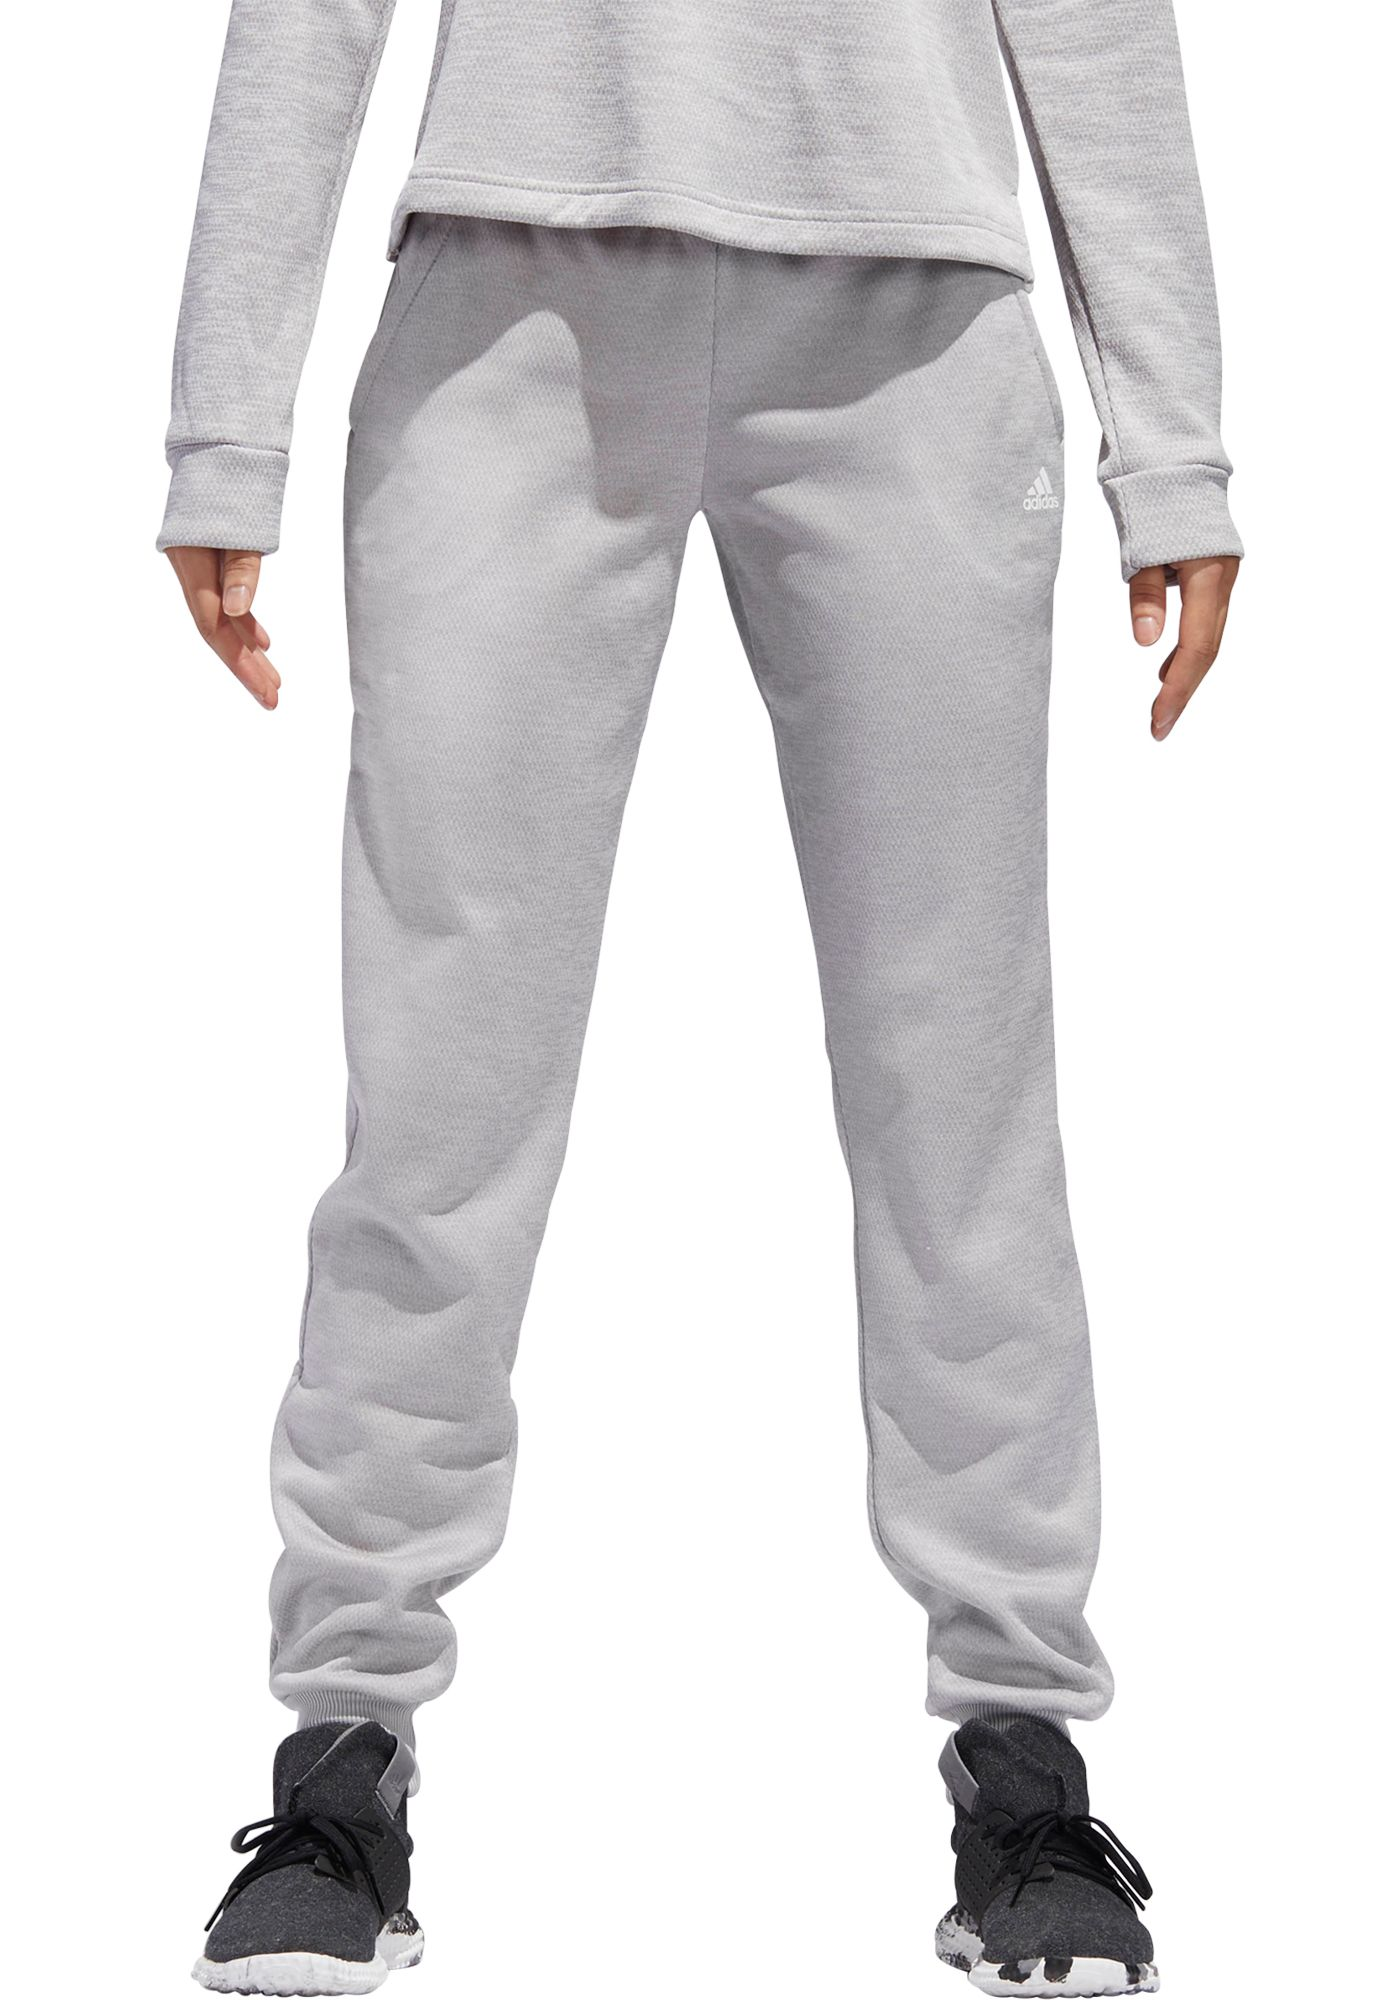 adidas Women's Team Issue Jogger Pants